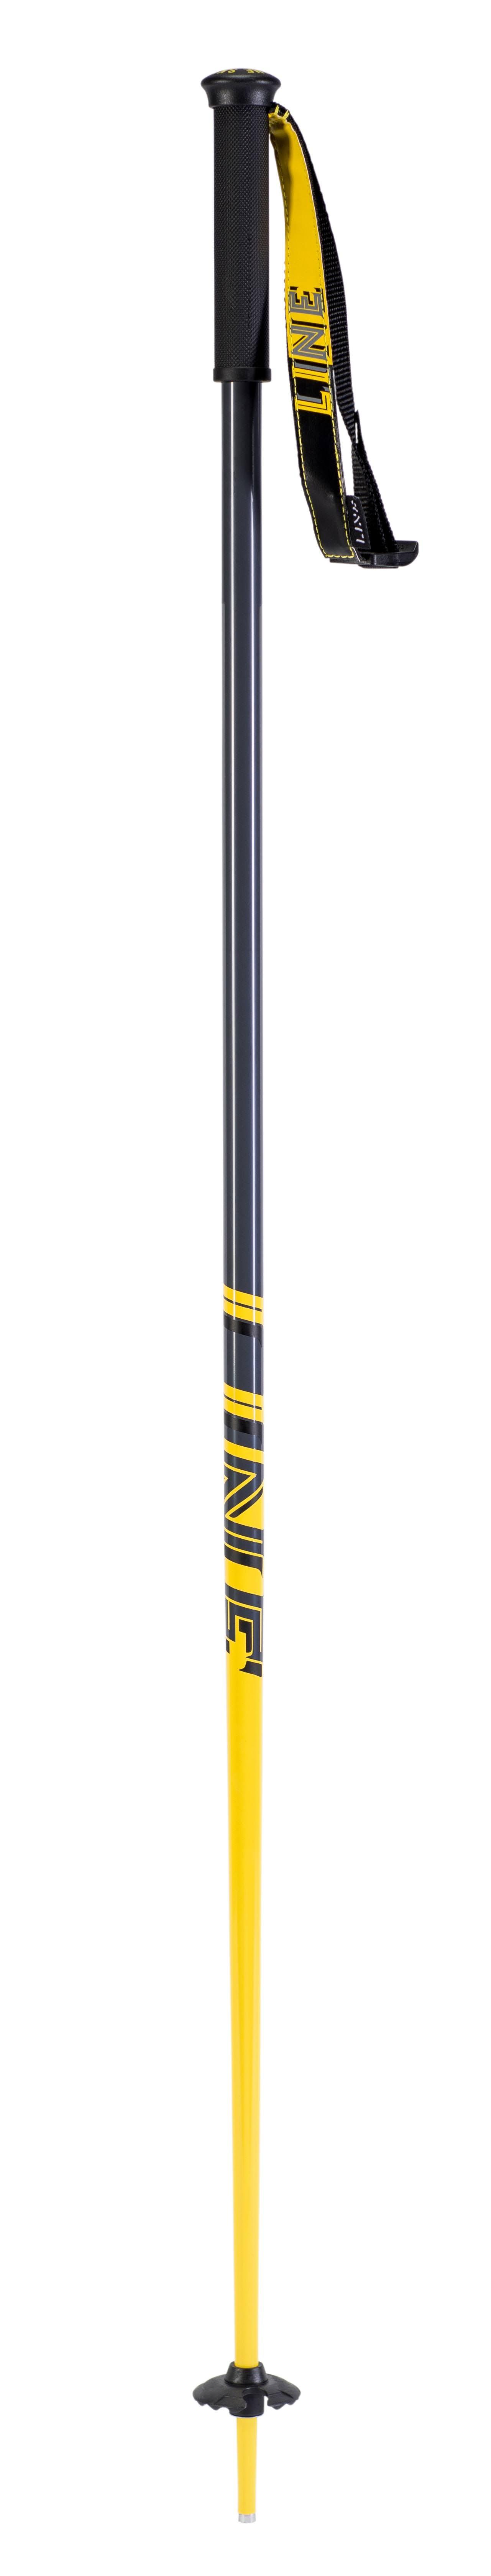 Line Skis Tac Ski Poles · 2020